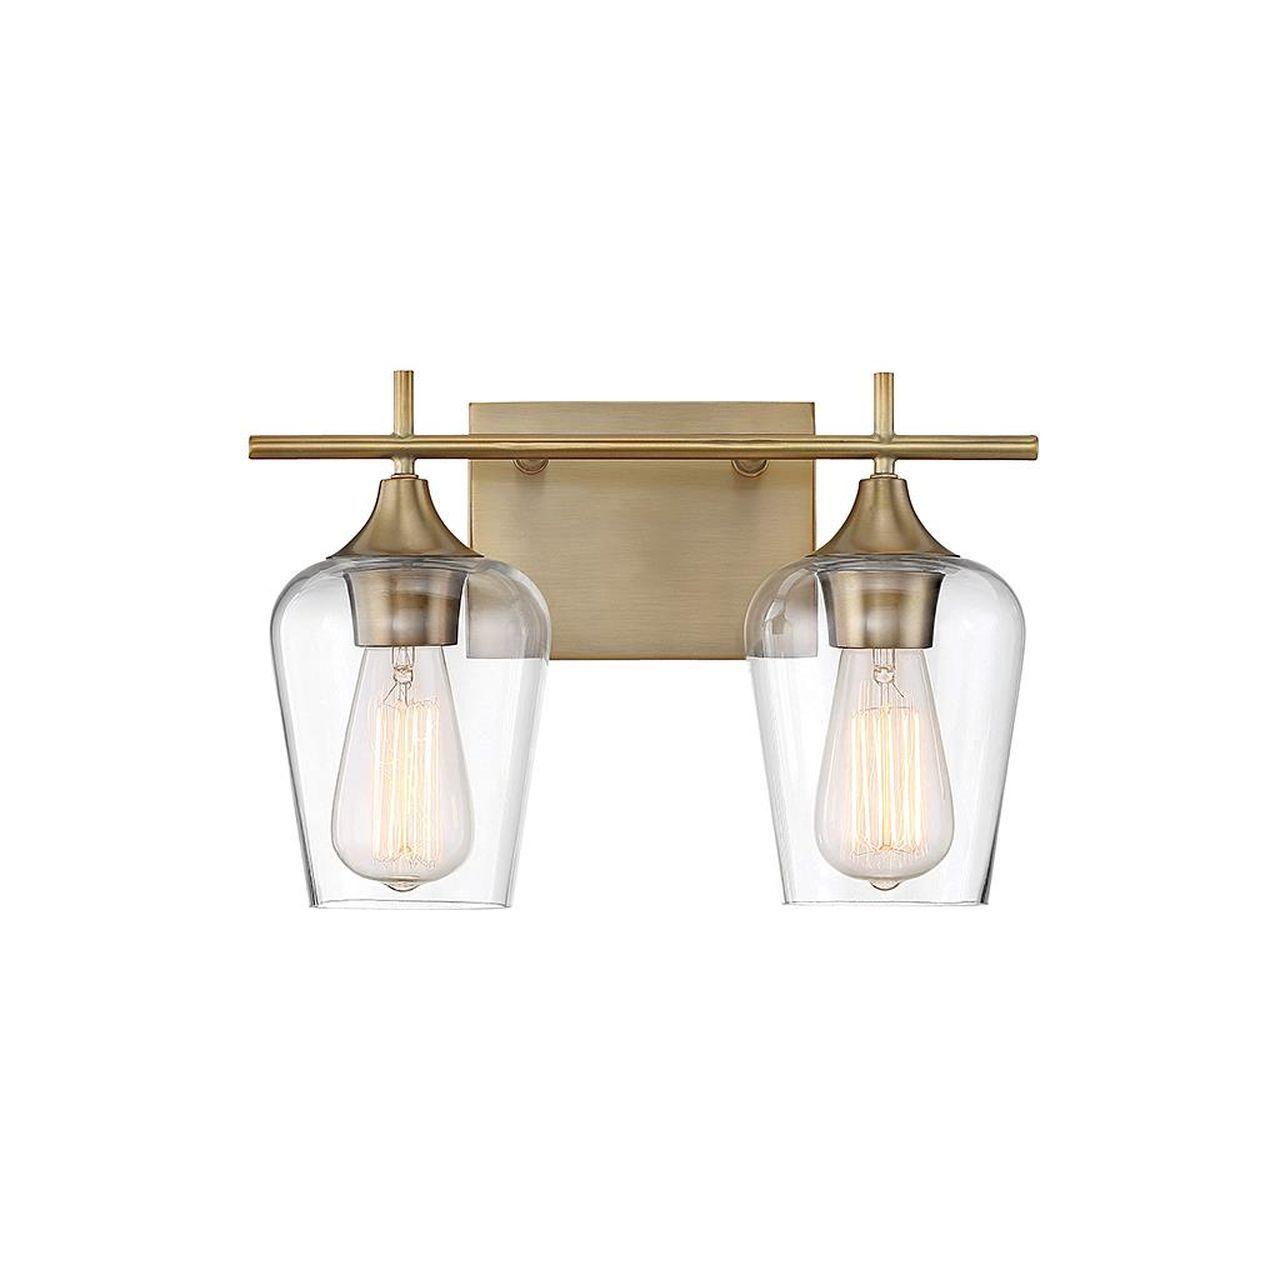 Octave 13 Inch 2 Light Bath Vanity Light | Capitol Lighting